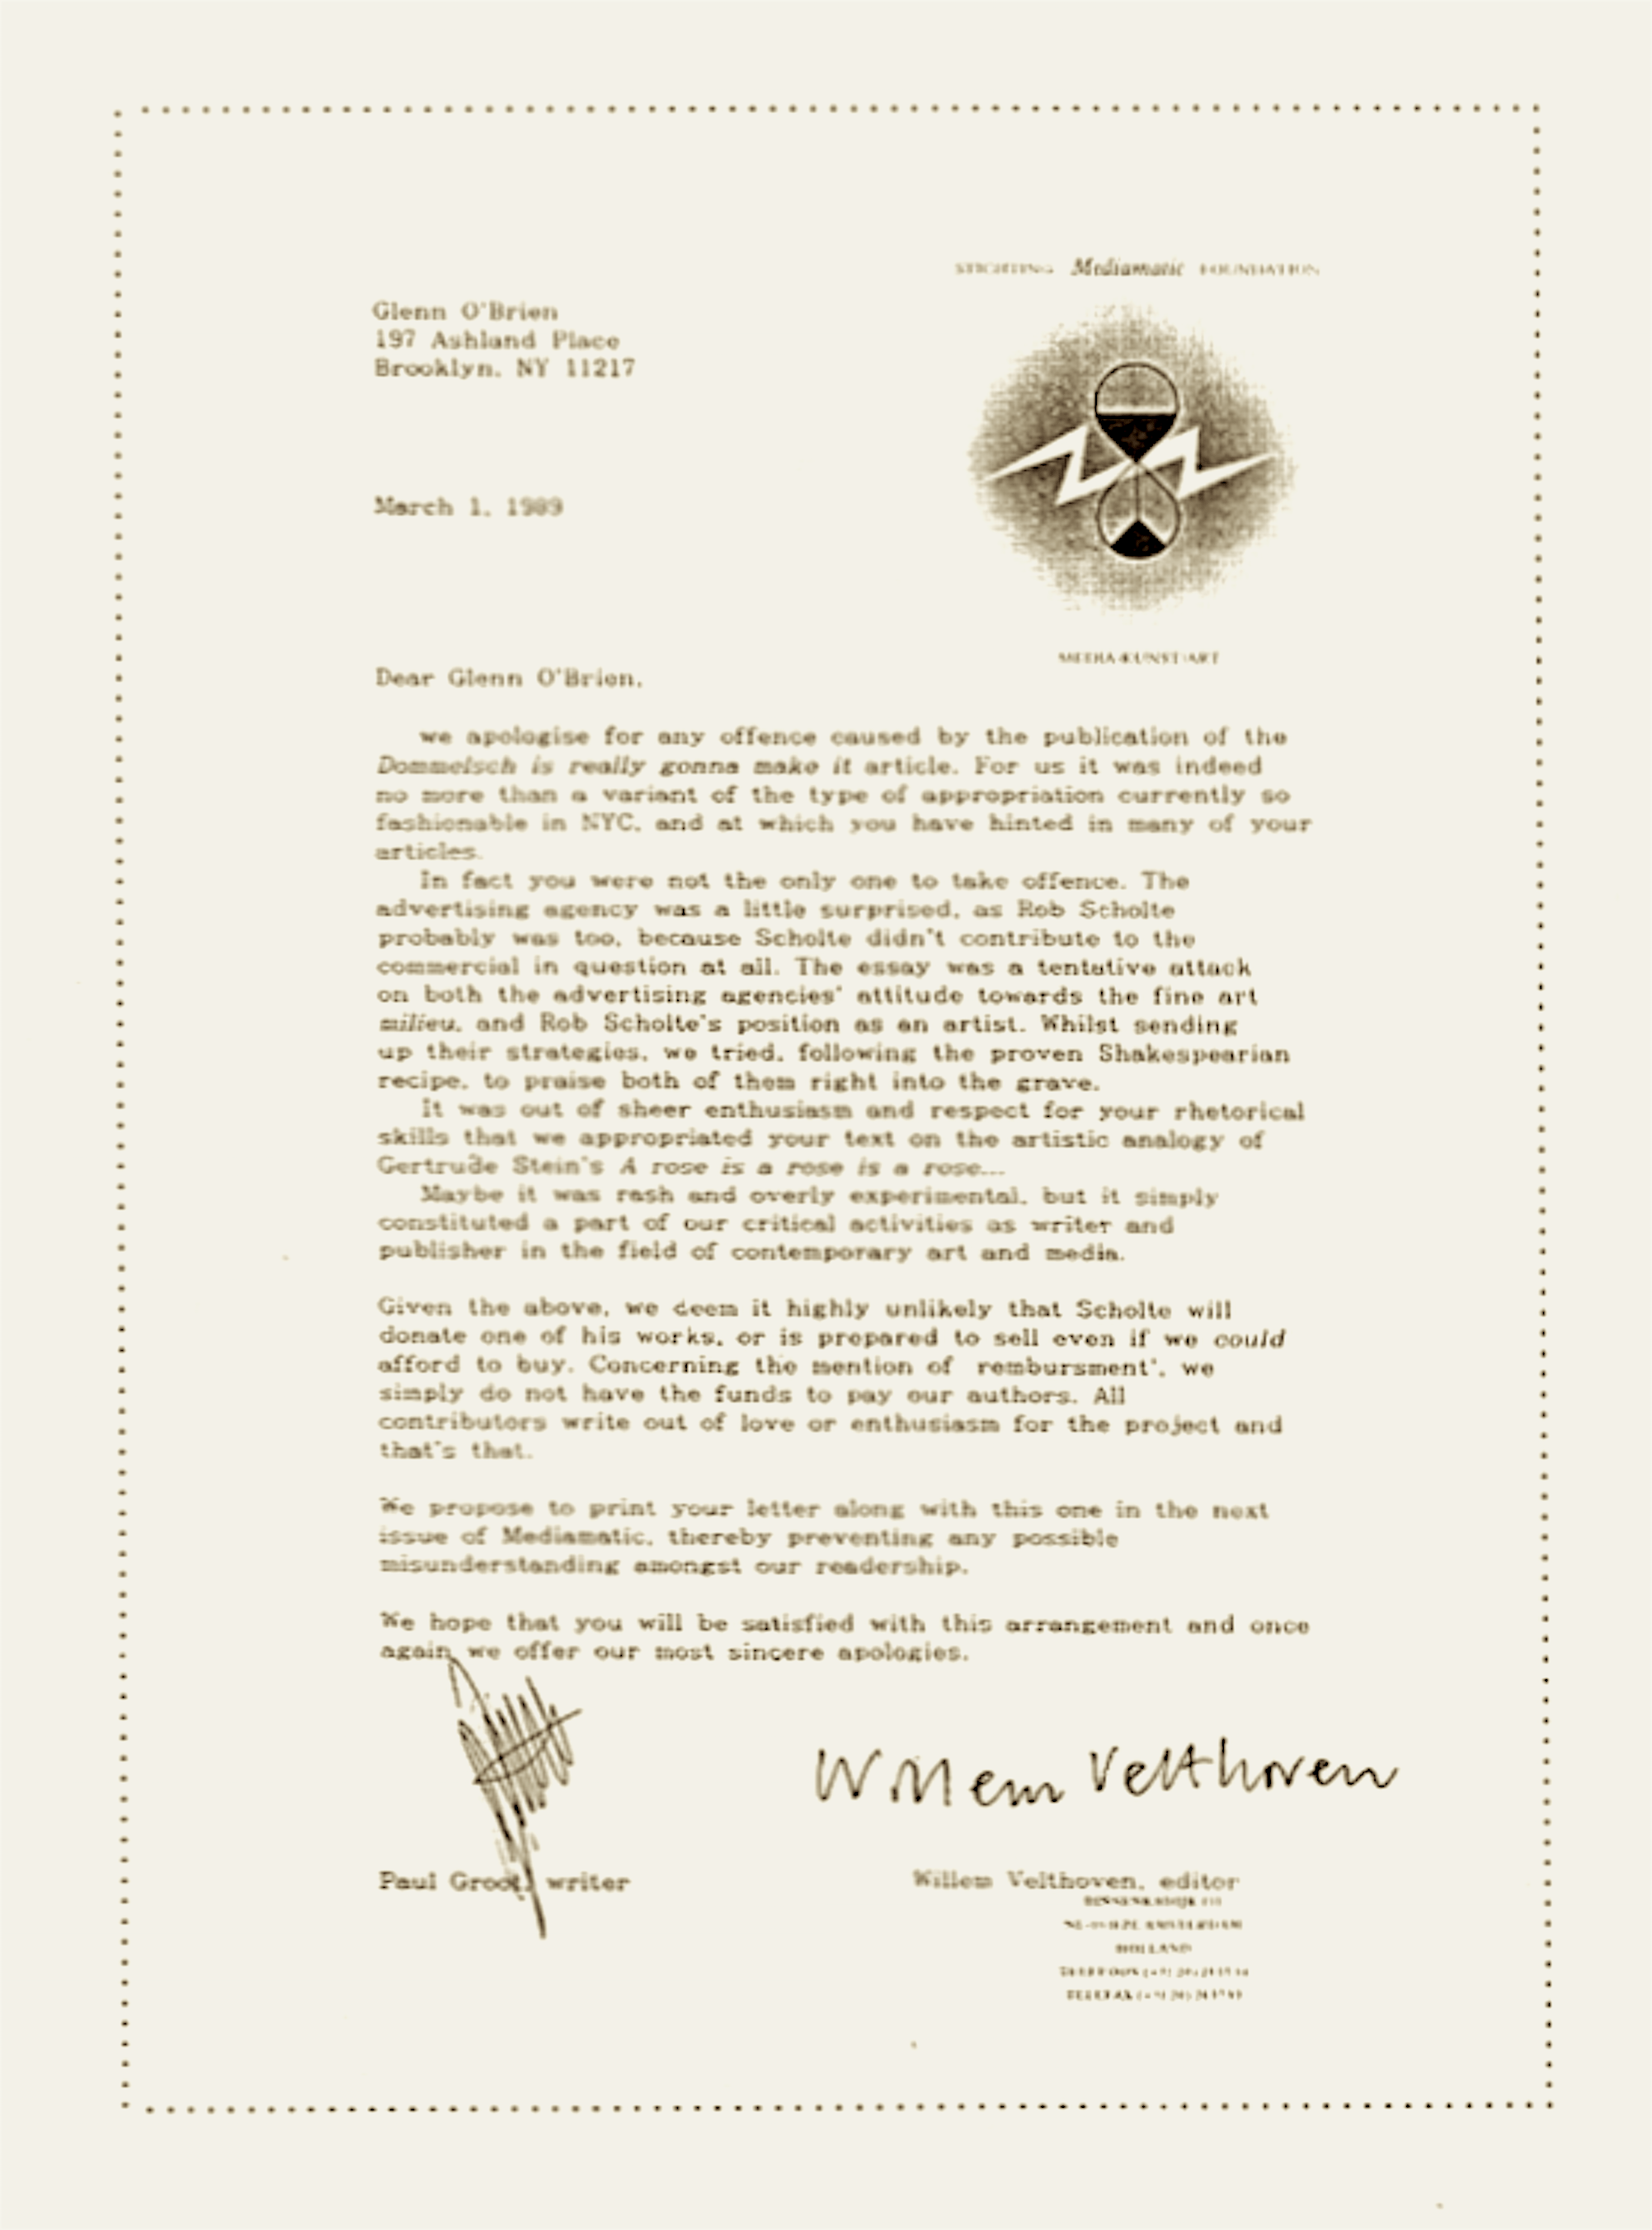 Paul groot willem velthoven letter to glenn obrien march 1 paul groot willem velthoven letter to glenn obrien march 1 1989 expocarfo Images